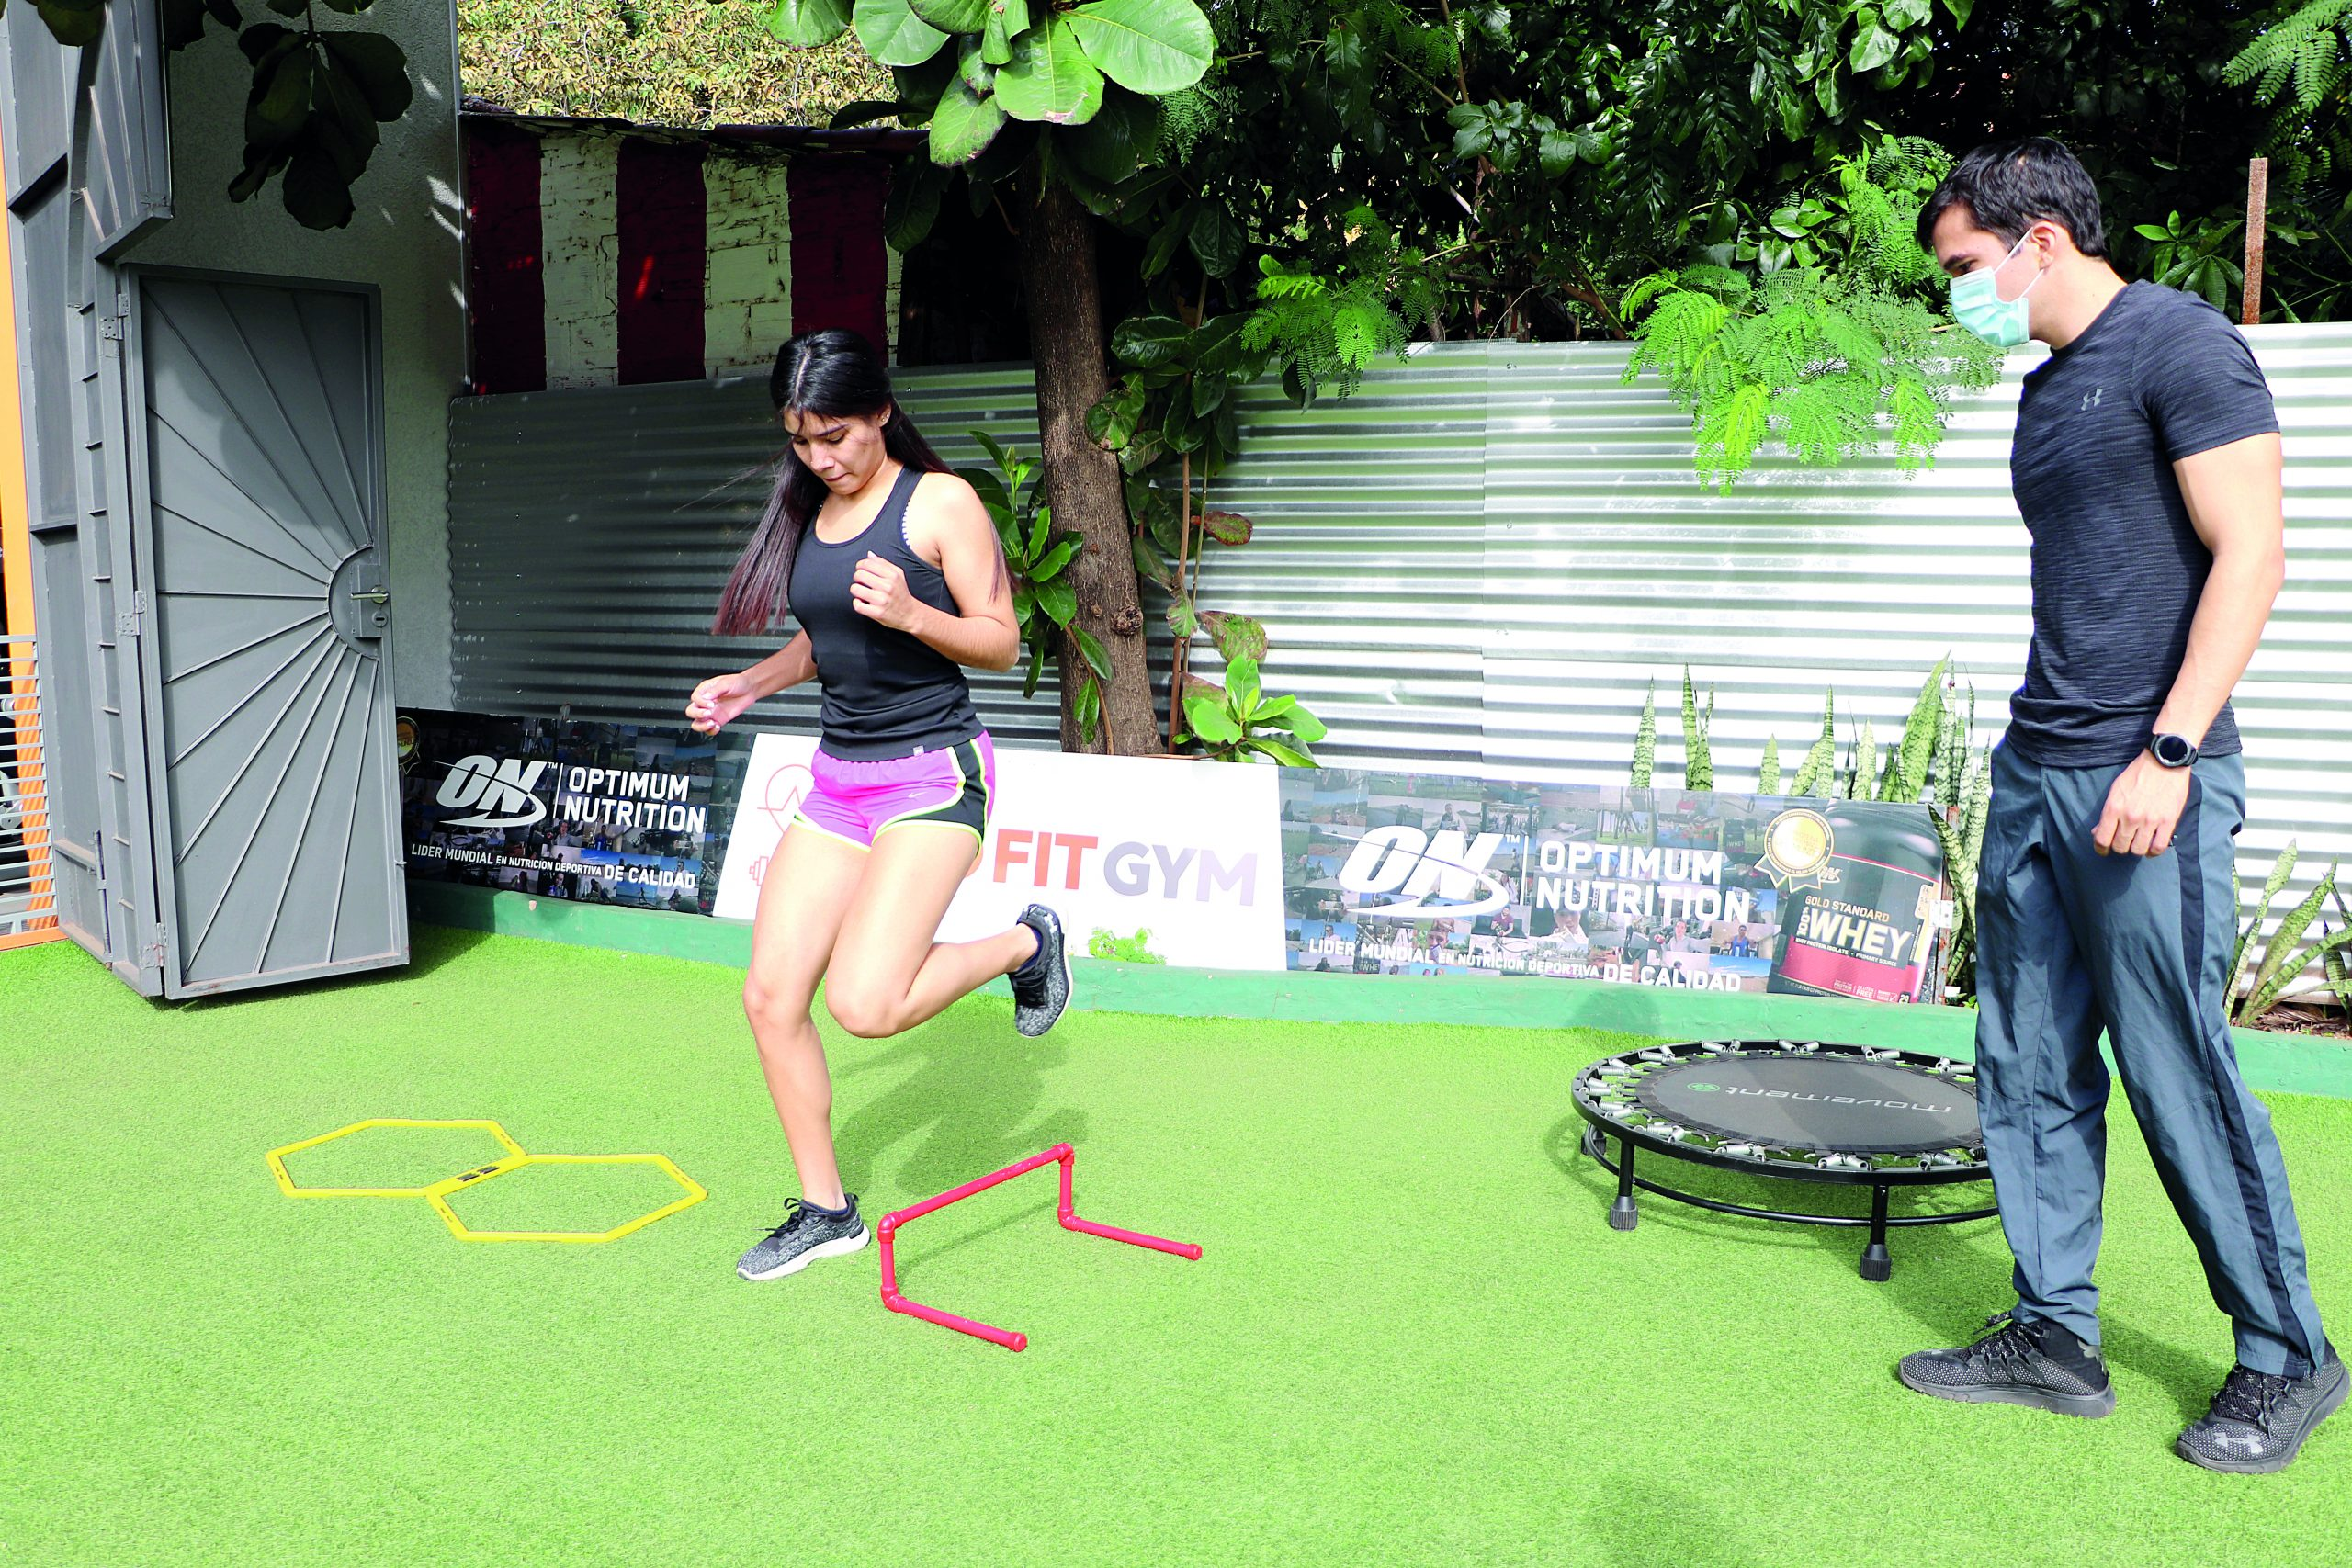 Go Fit Gym, sin excusas para cumplir objetivos